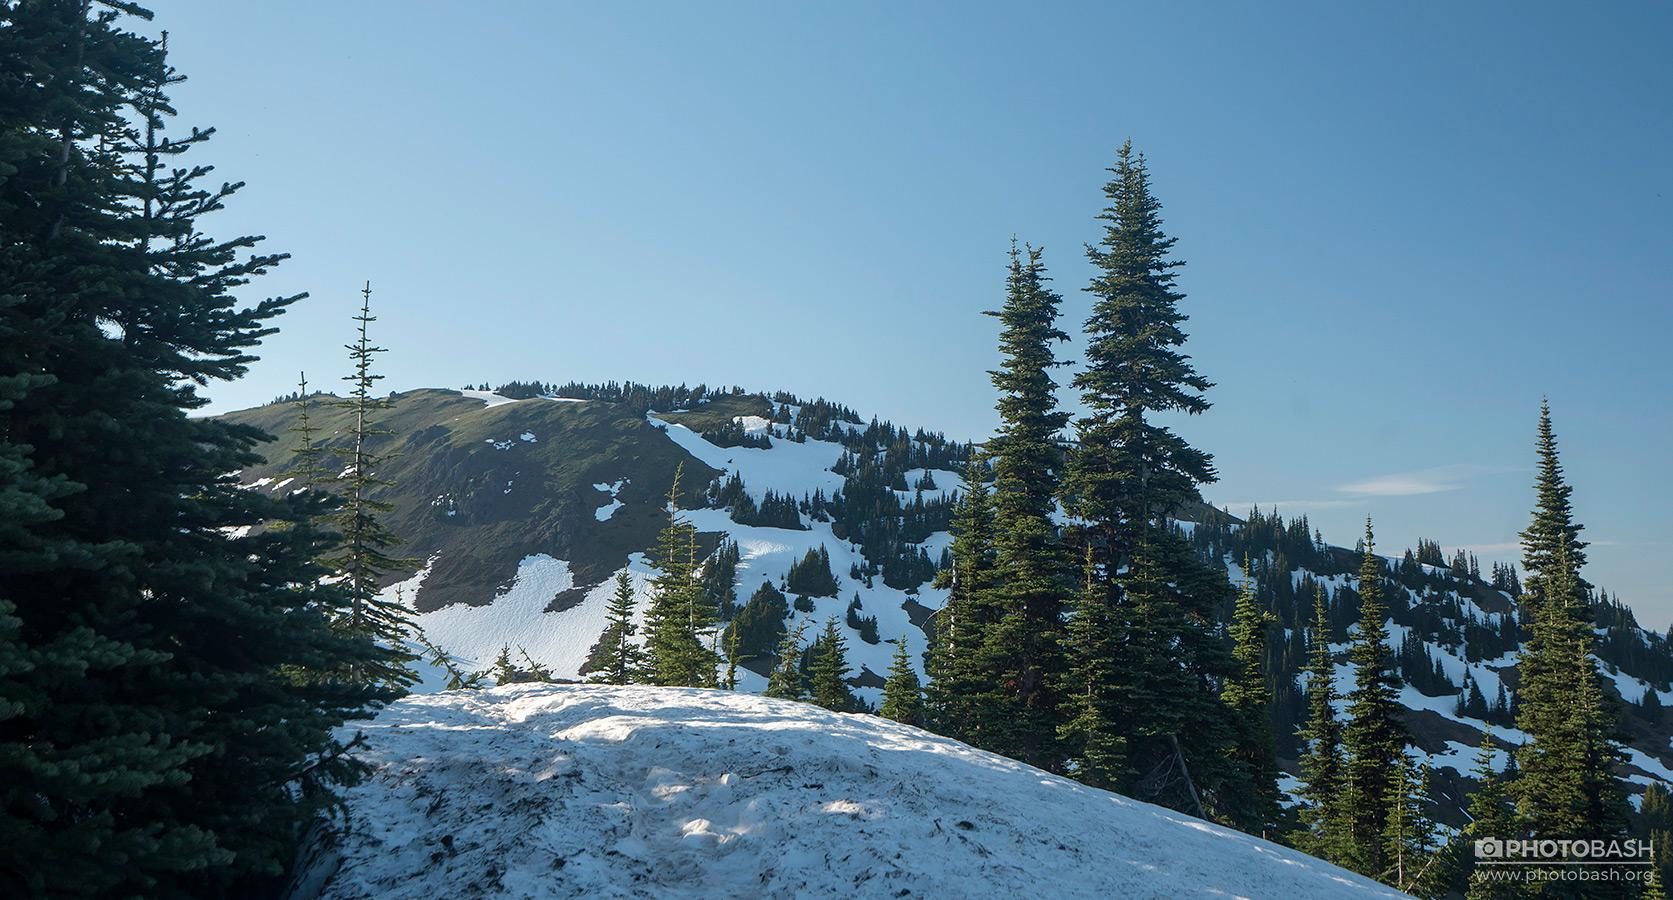 Pinewood-Mountains-Snowy-Spruce-Trees.jpg